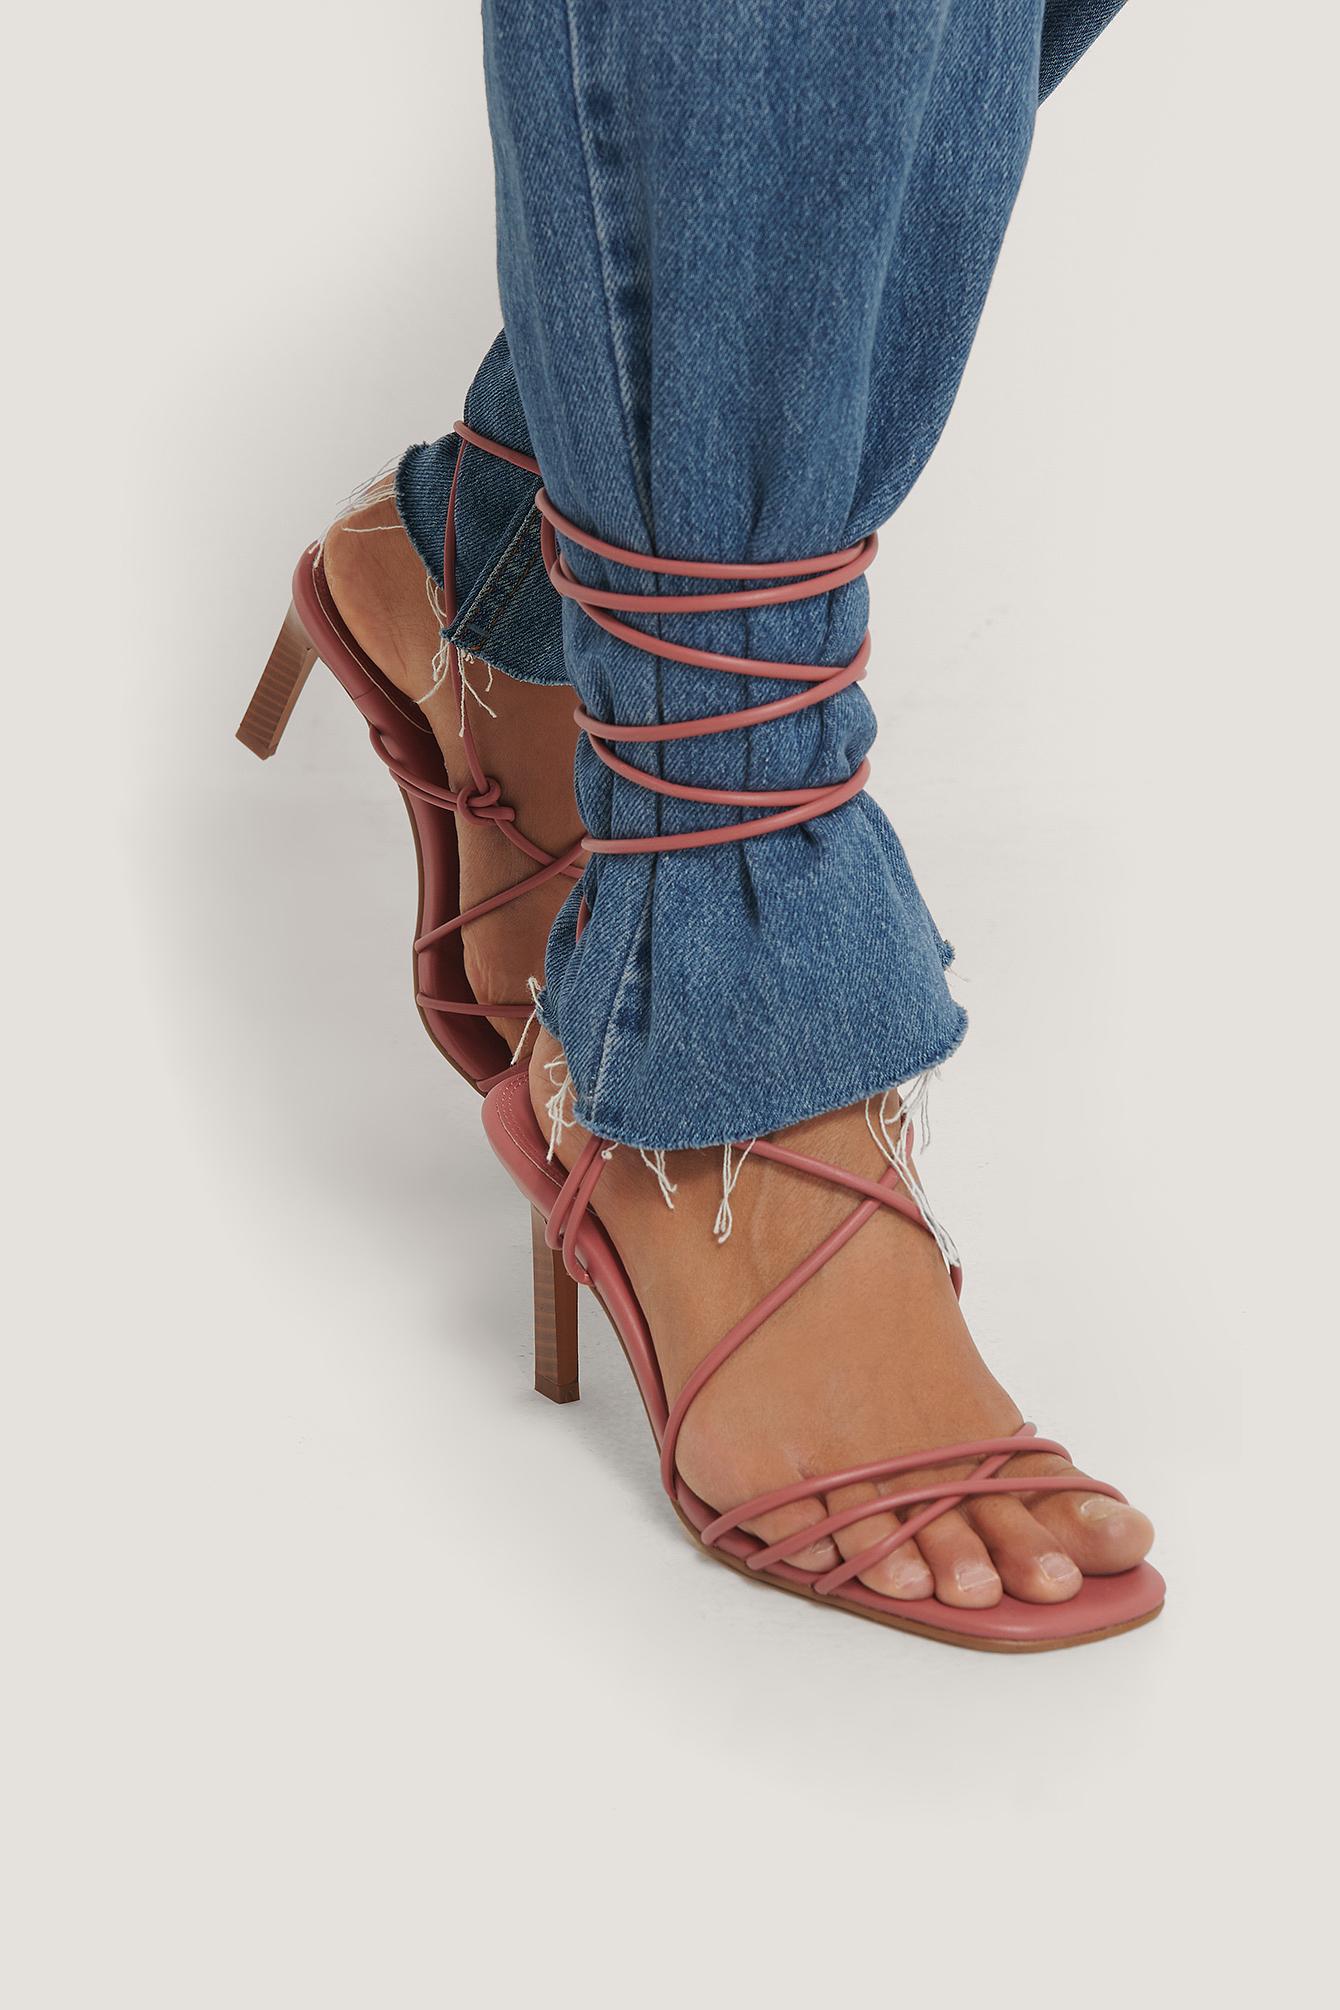 na-kd shoes -  Absatzschuhe Mit Riemen - Pink